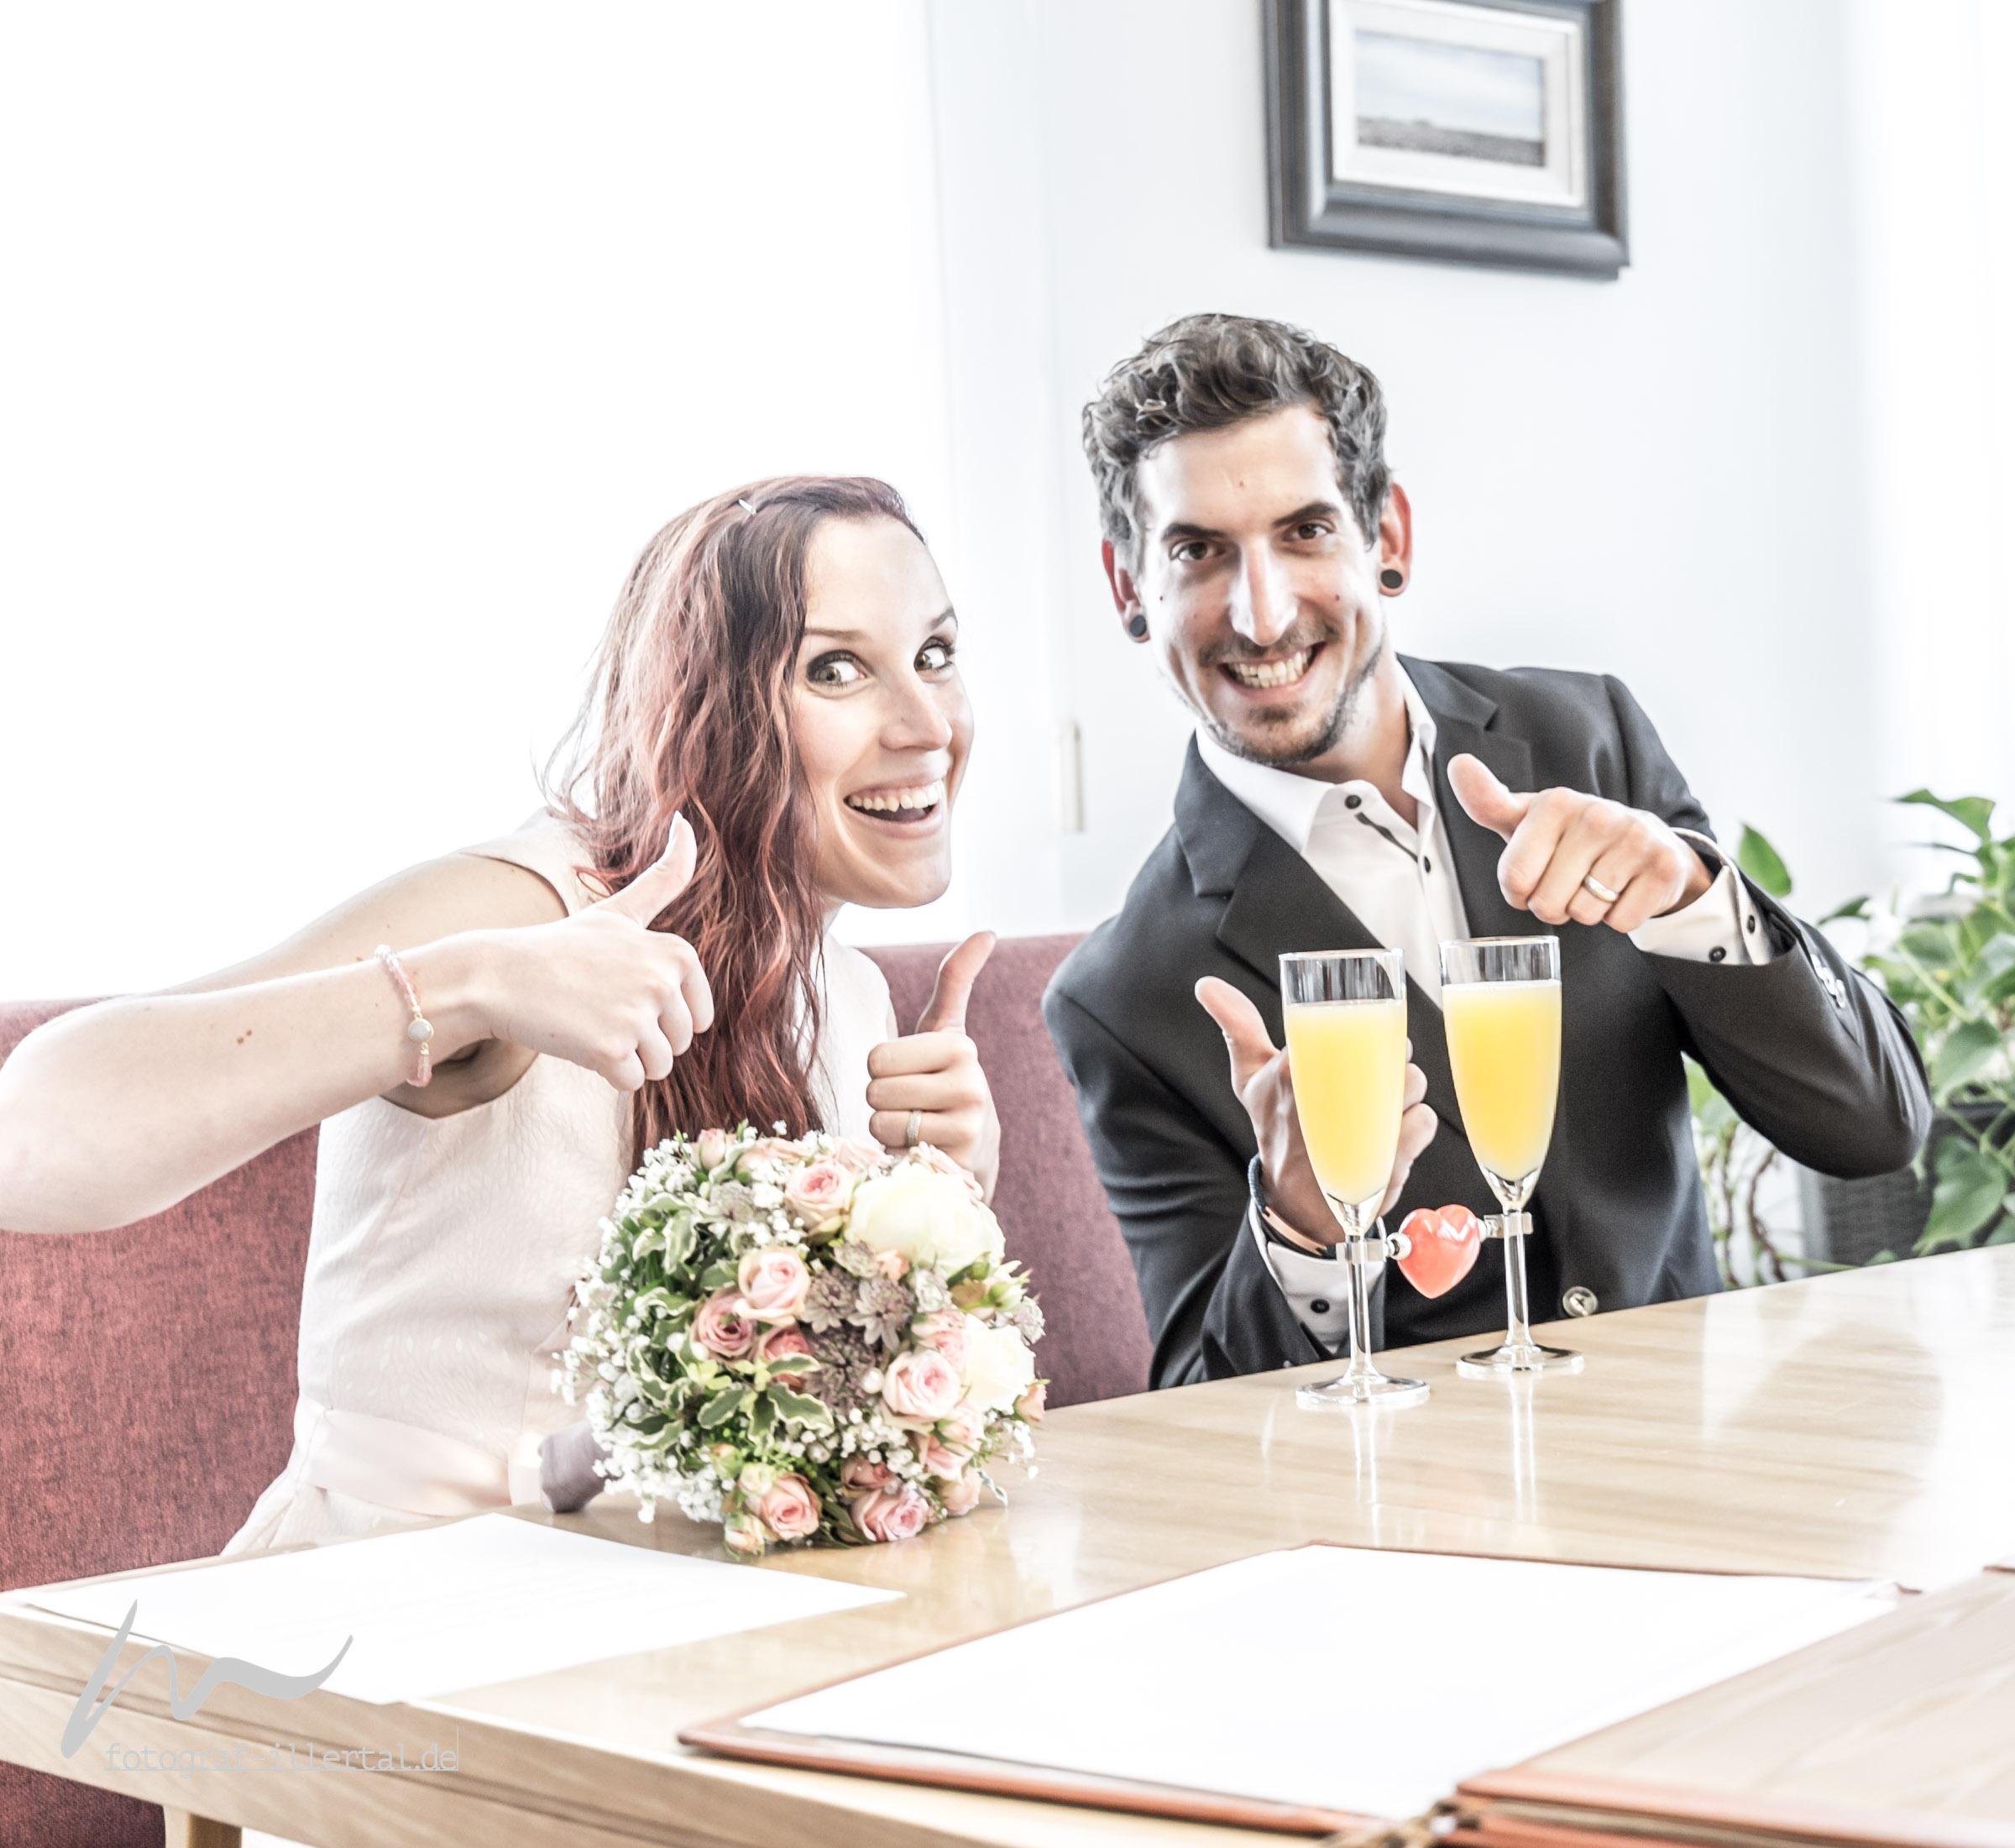 Fotograf Illertal-Christian Miller-Hochzeitsfotografie-_MG_1307